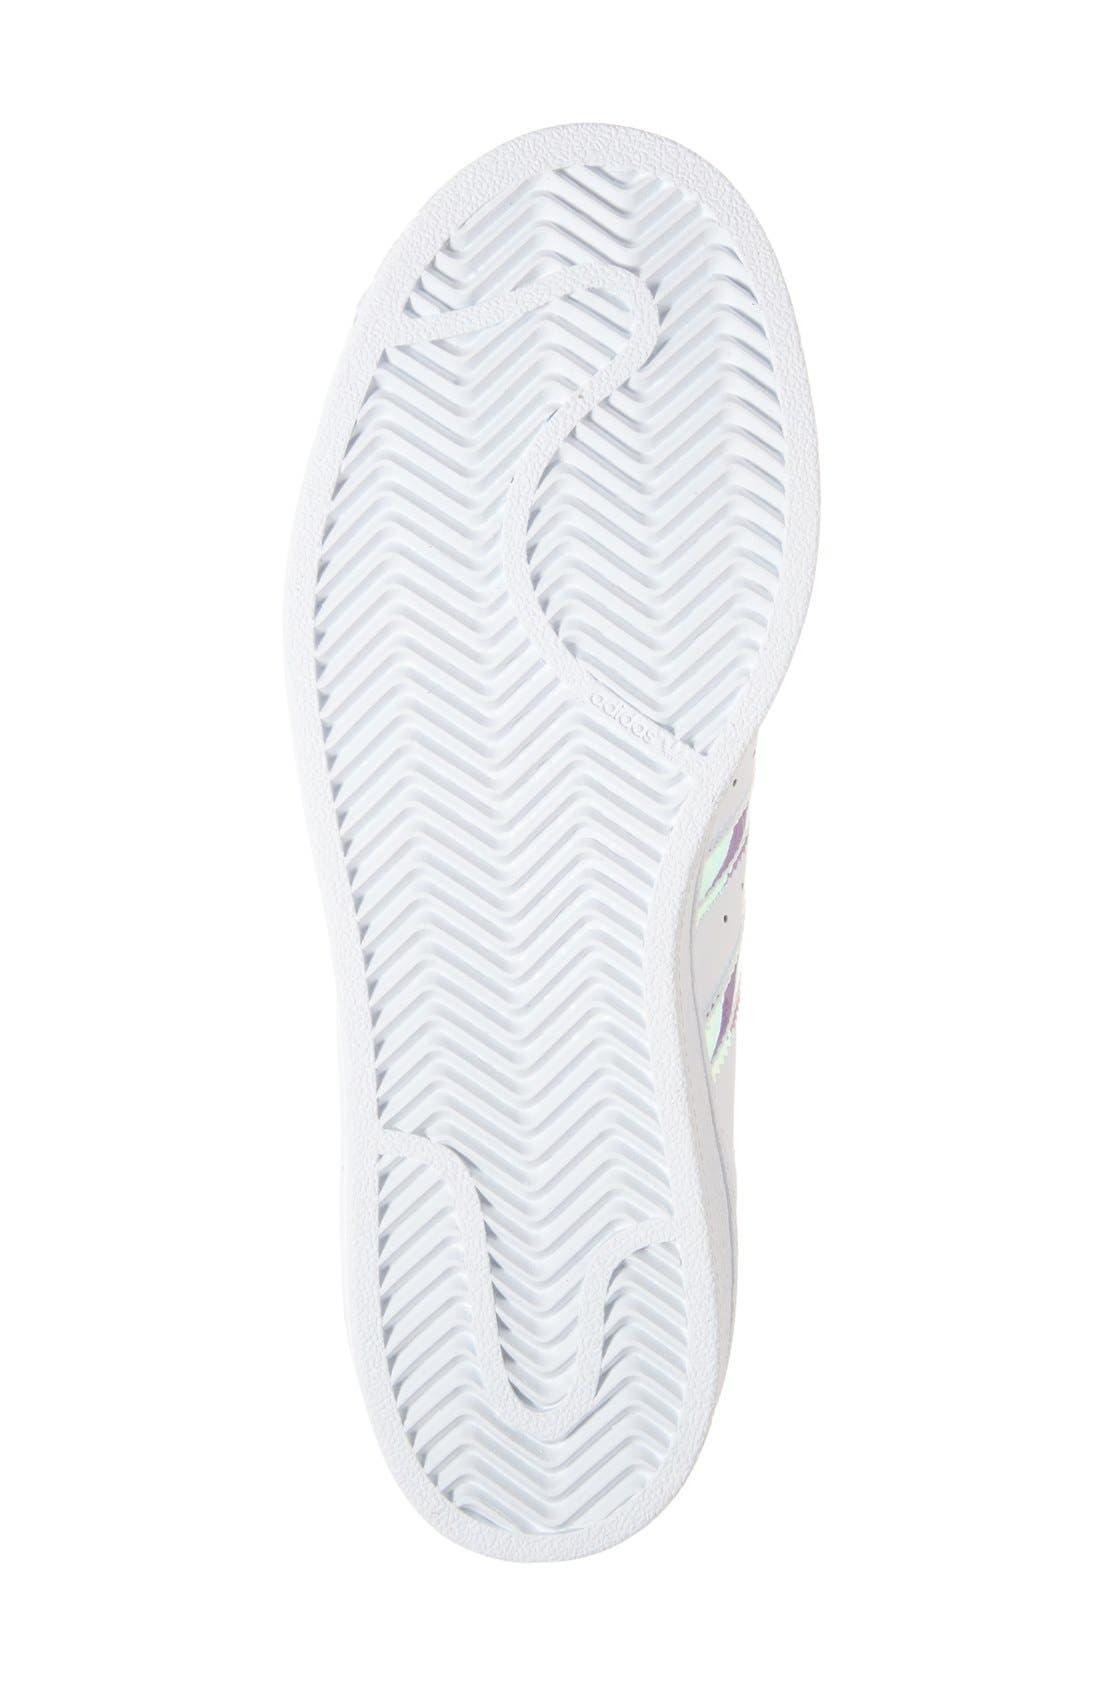 Superstar - Iridescent Sneaker,                             Alternate thumbnail 11, color,                             SILVER METALLIC/ WHITE